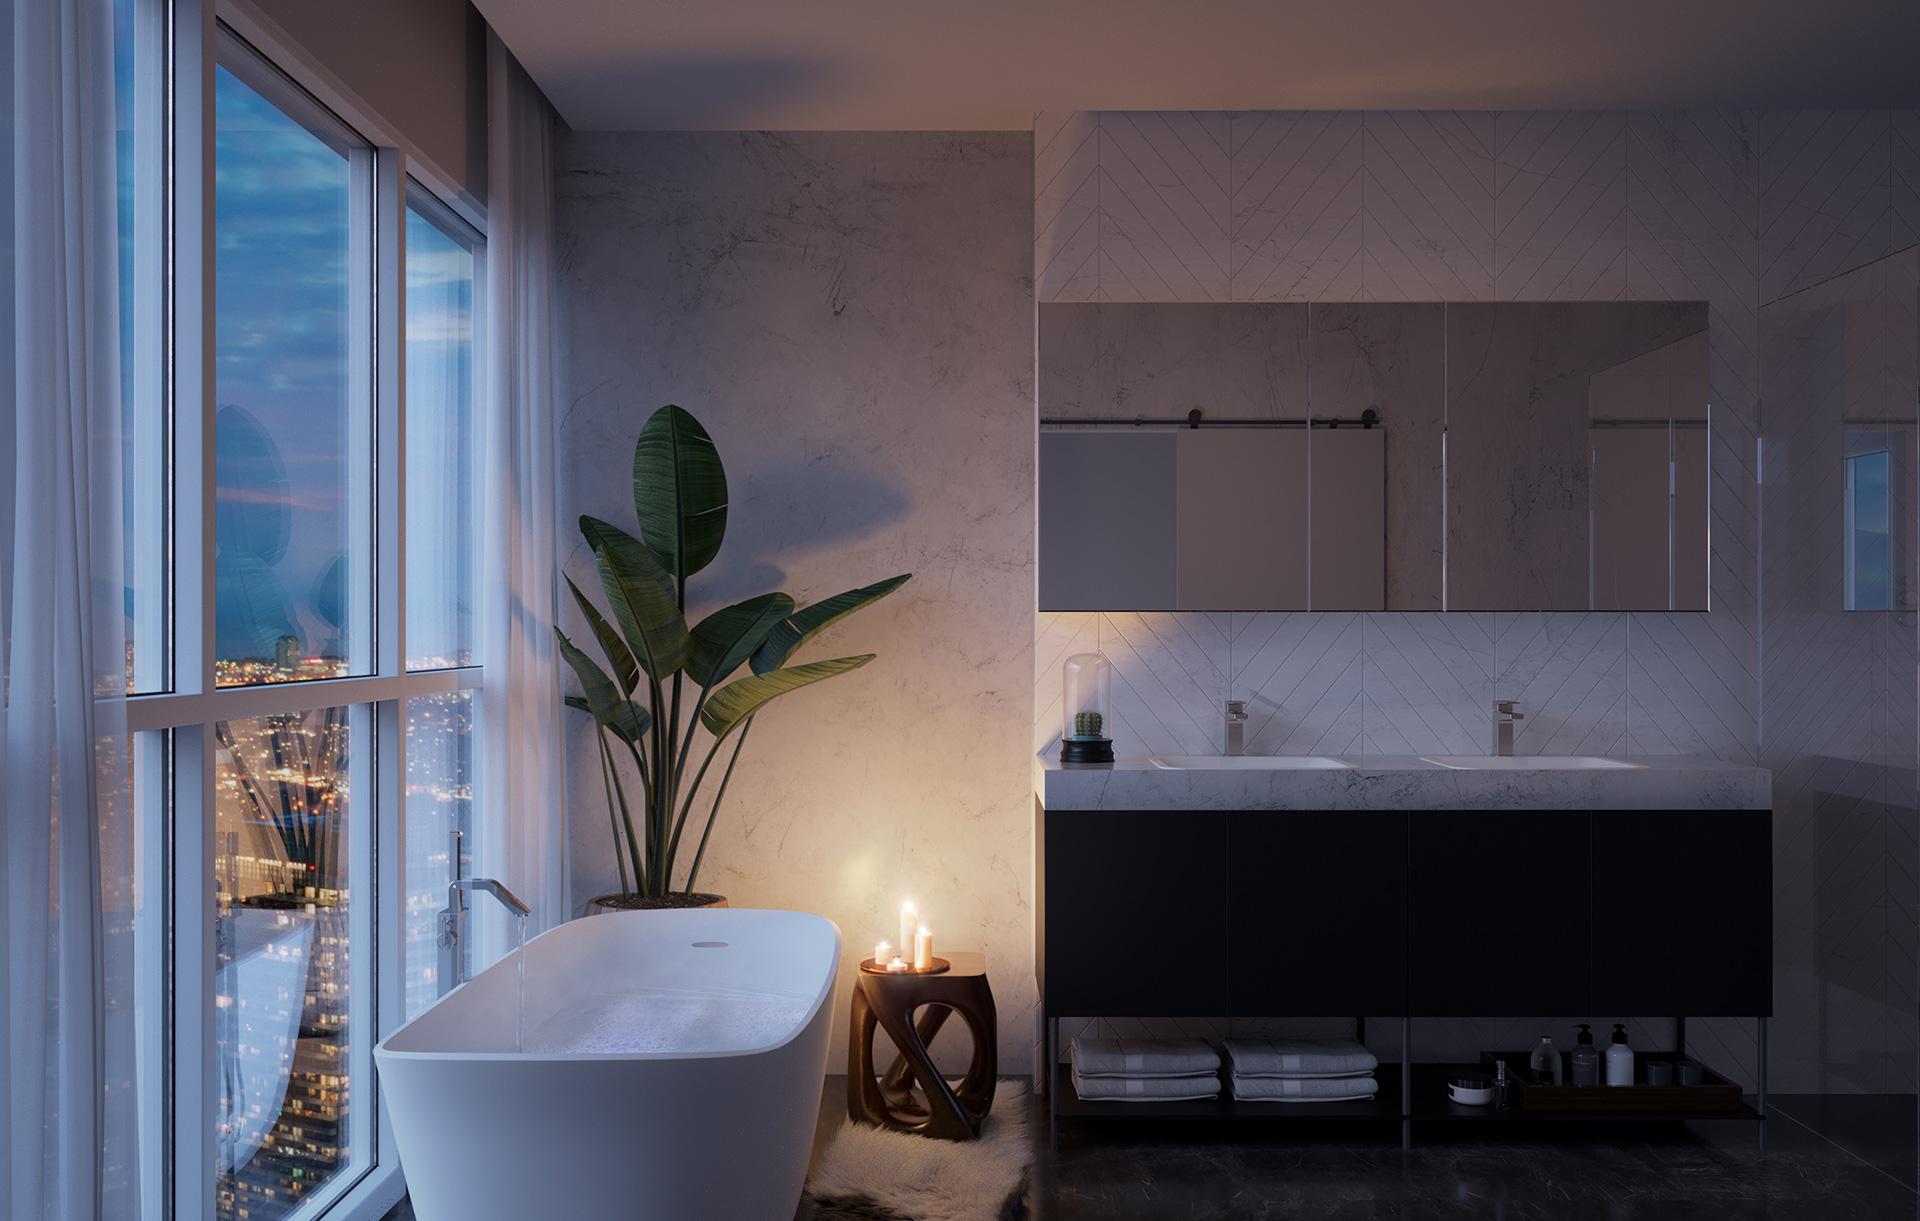 NORM-LI_180720_INT_bathroom_01_v3.jpg